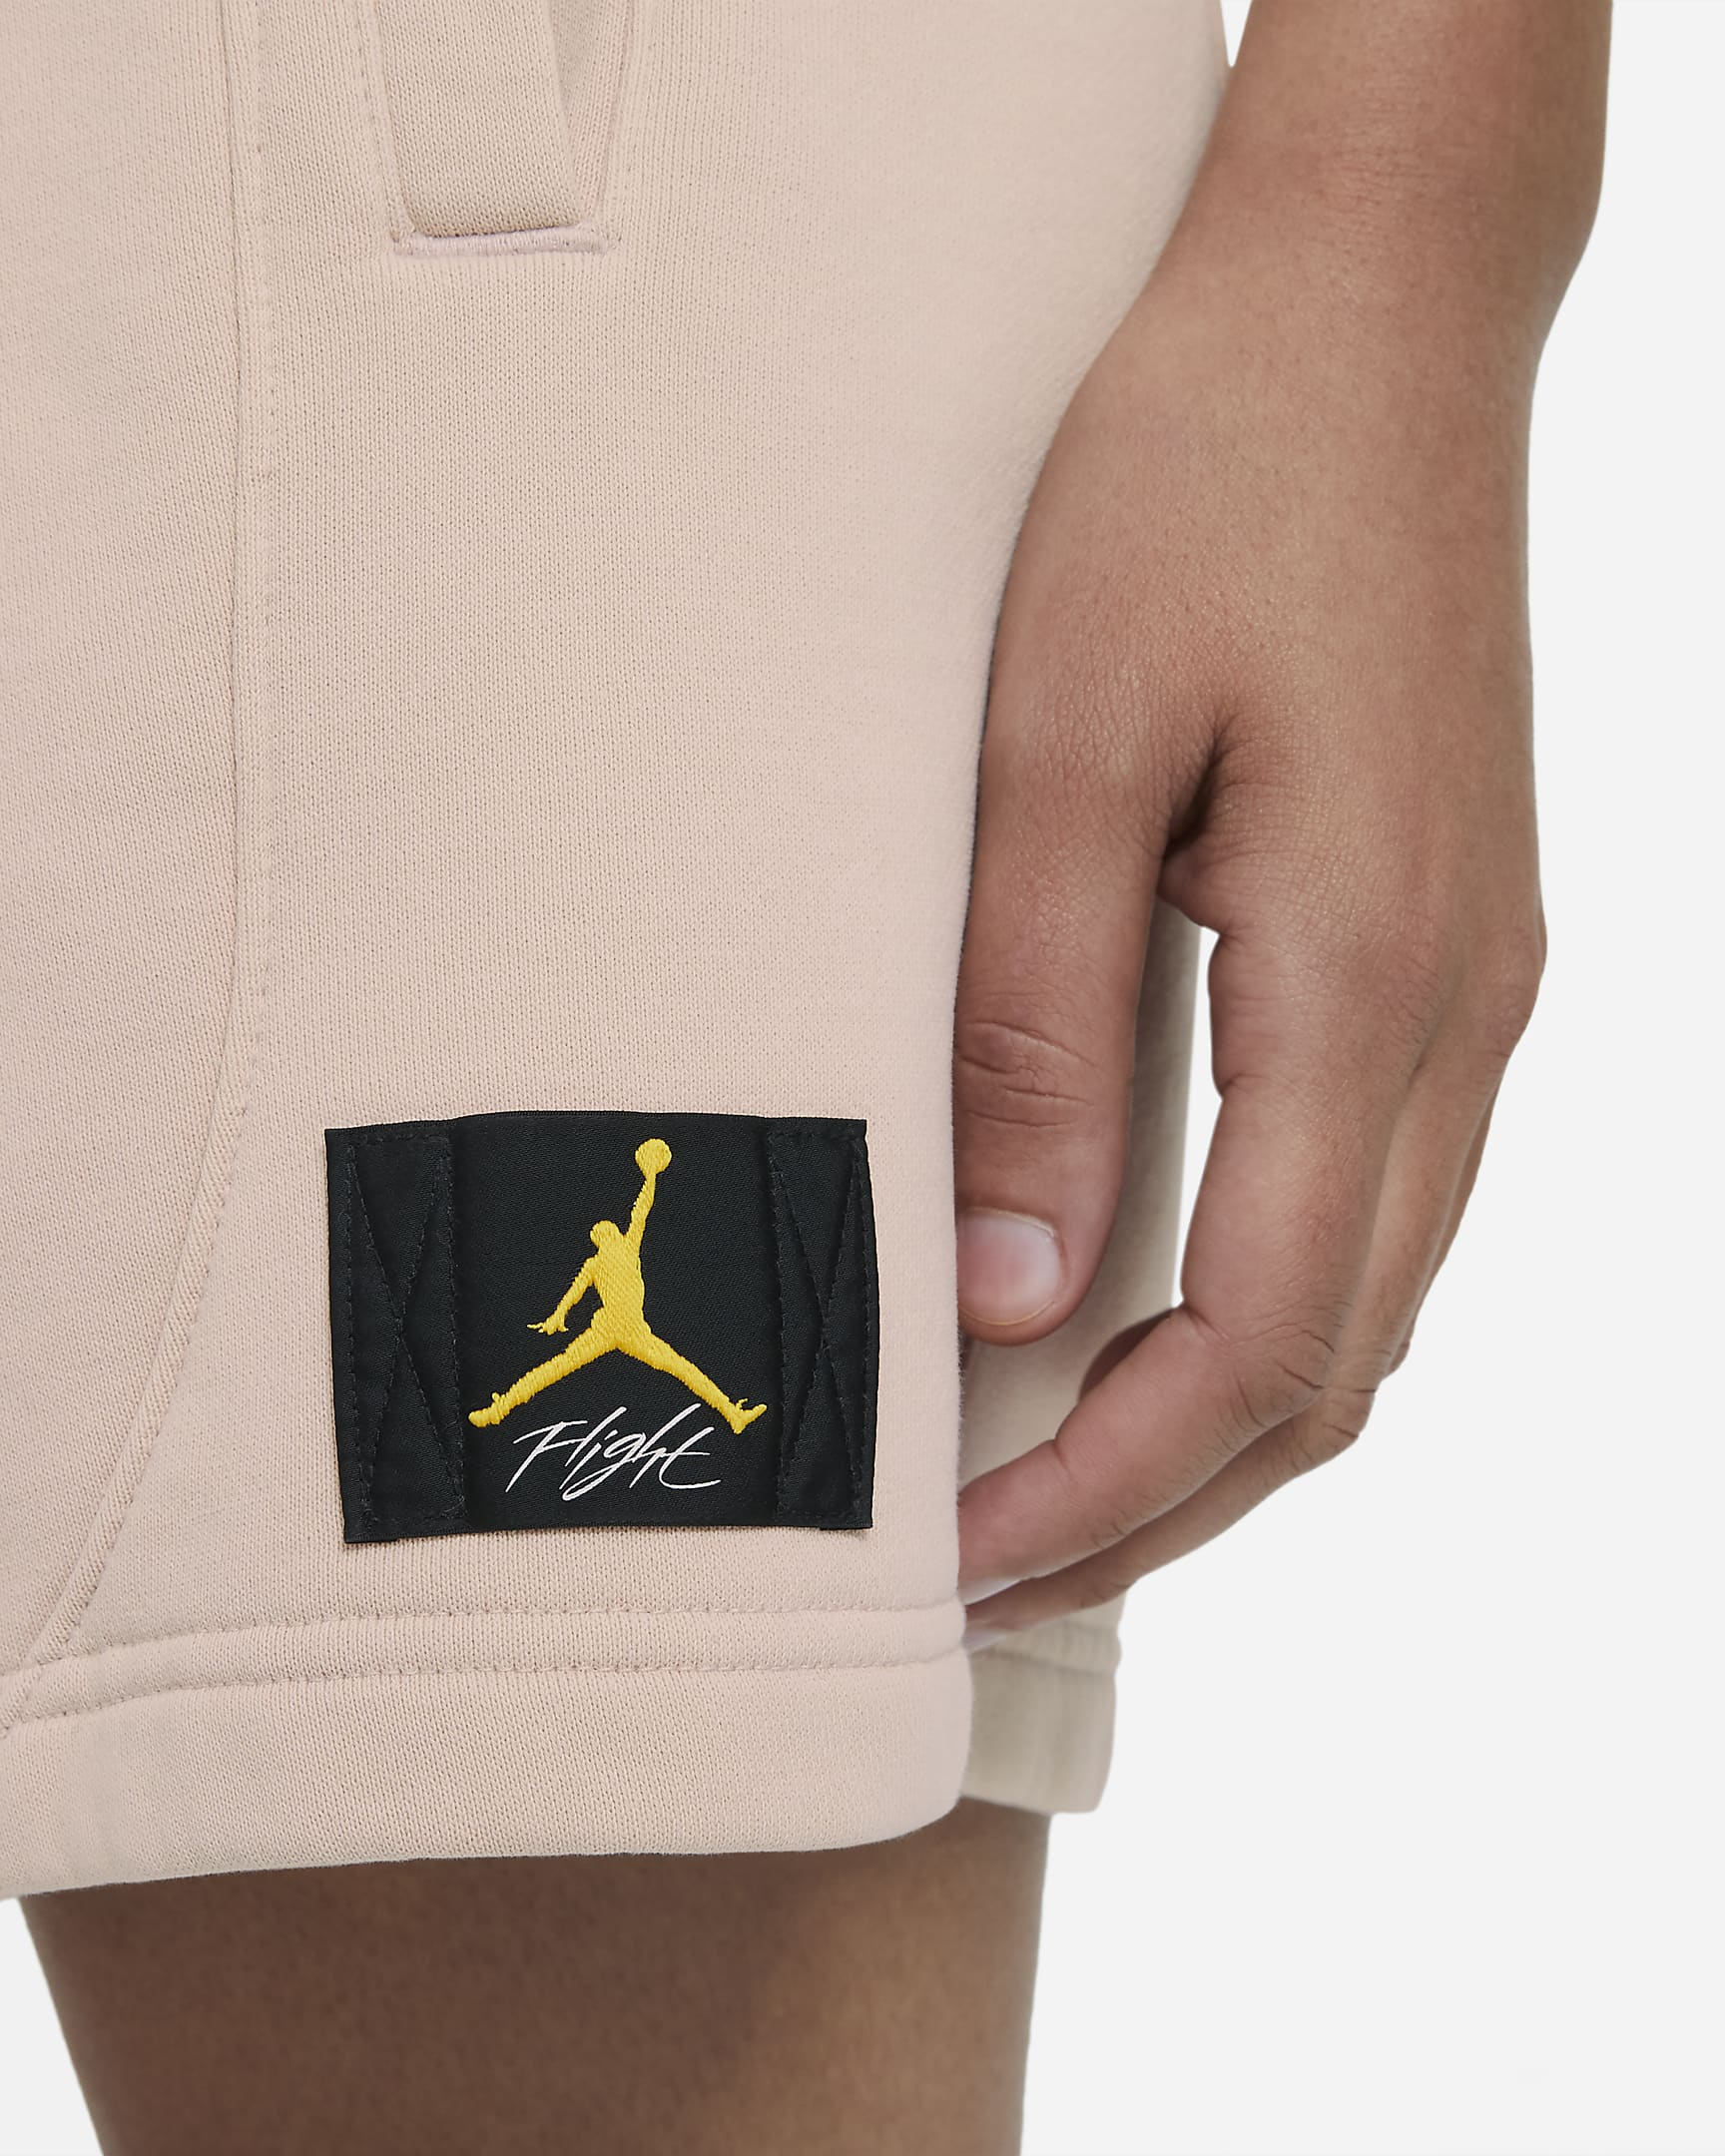 jordan-flight-womens-fleece-shorts-zDGn42-2